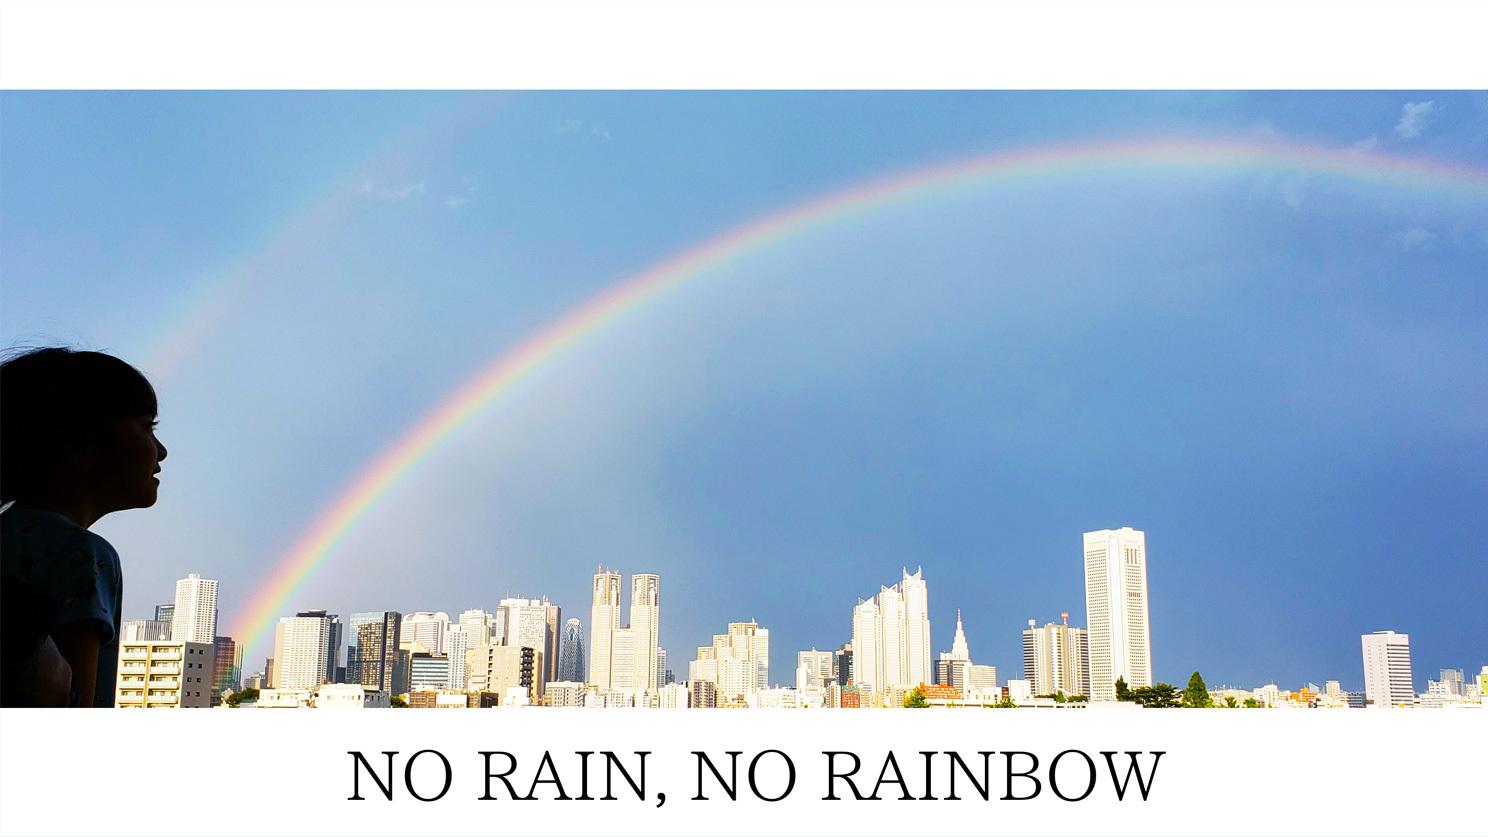 「NO RAIN, NO RAINBOW」_d0224894_02582050.jpg